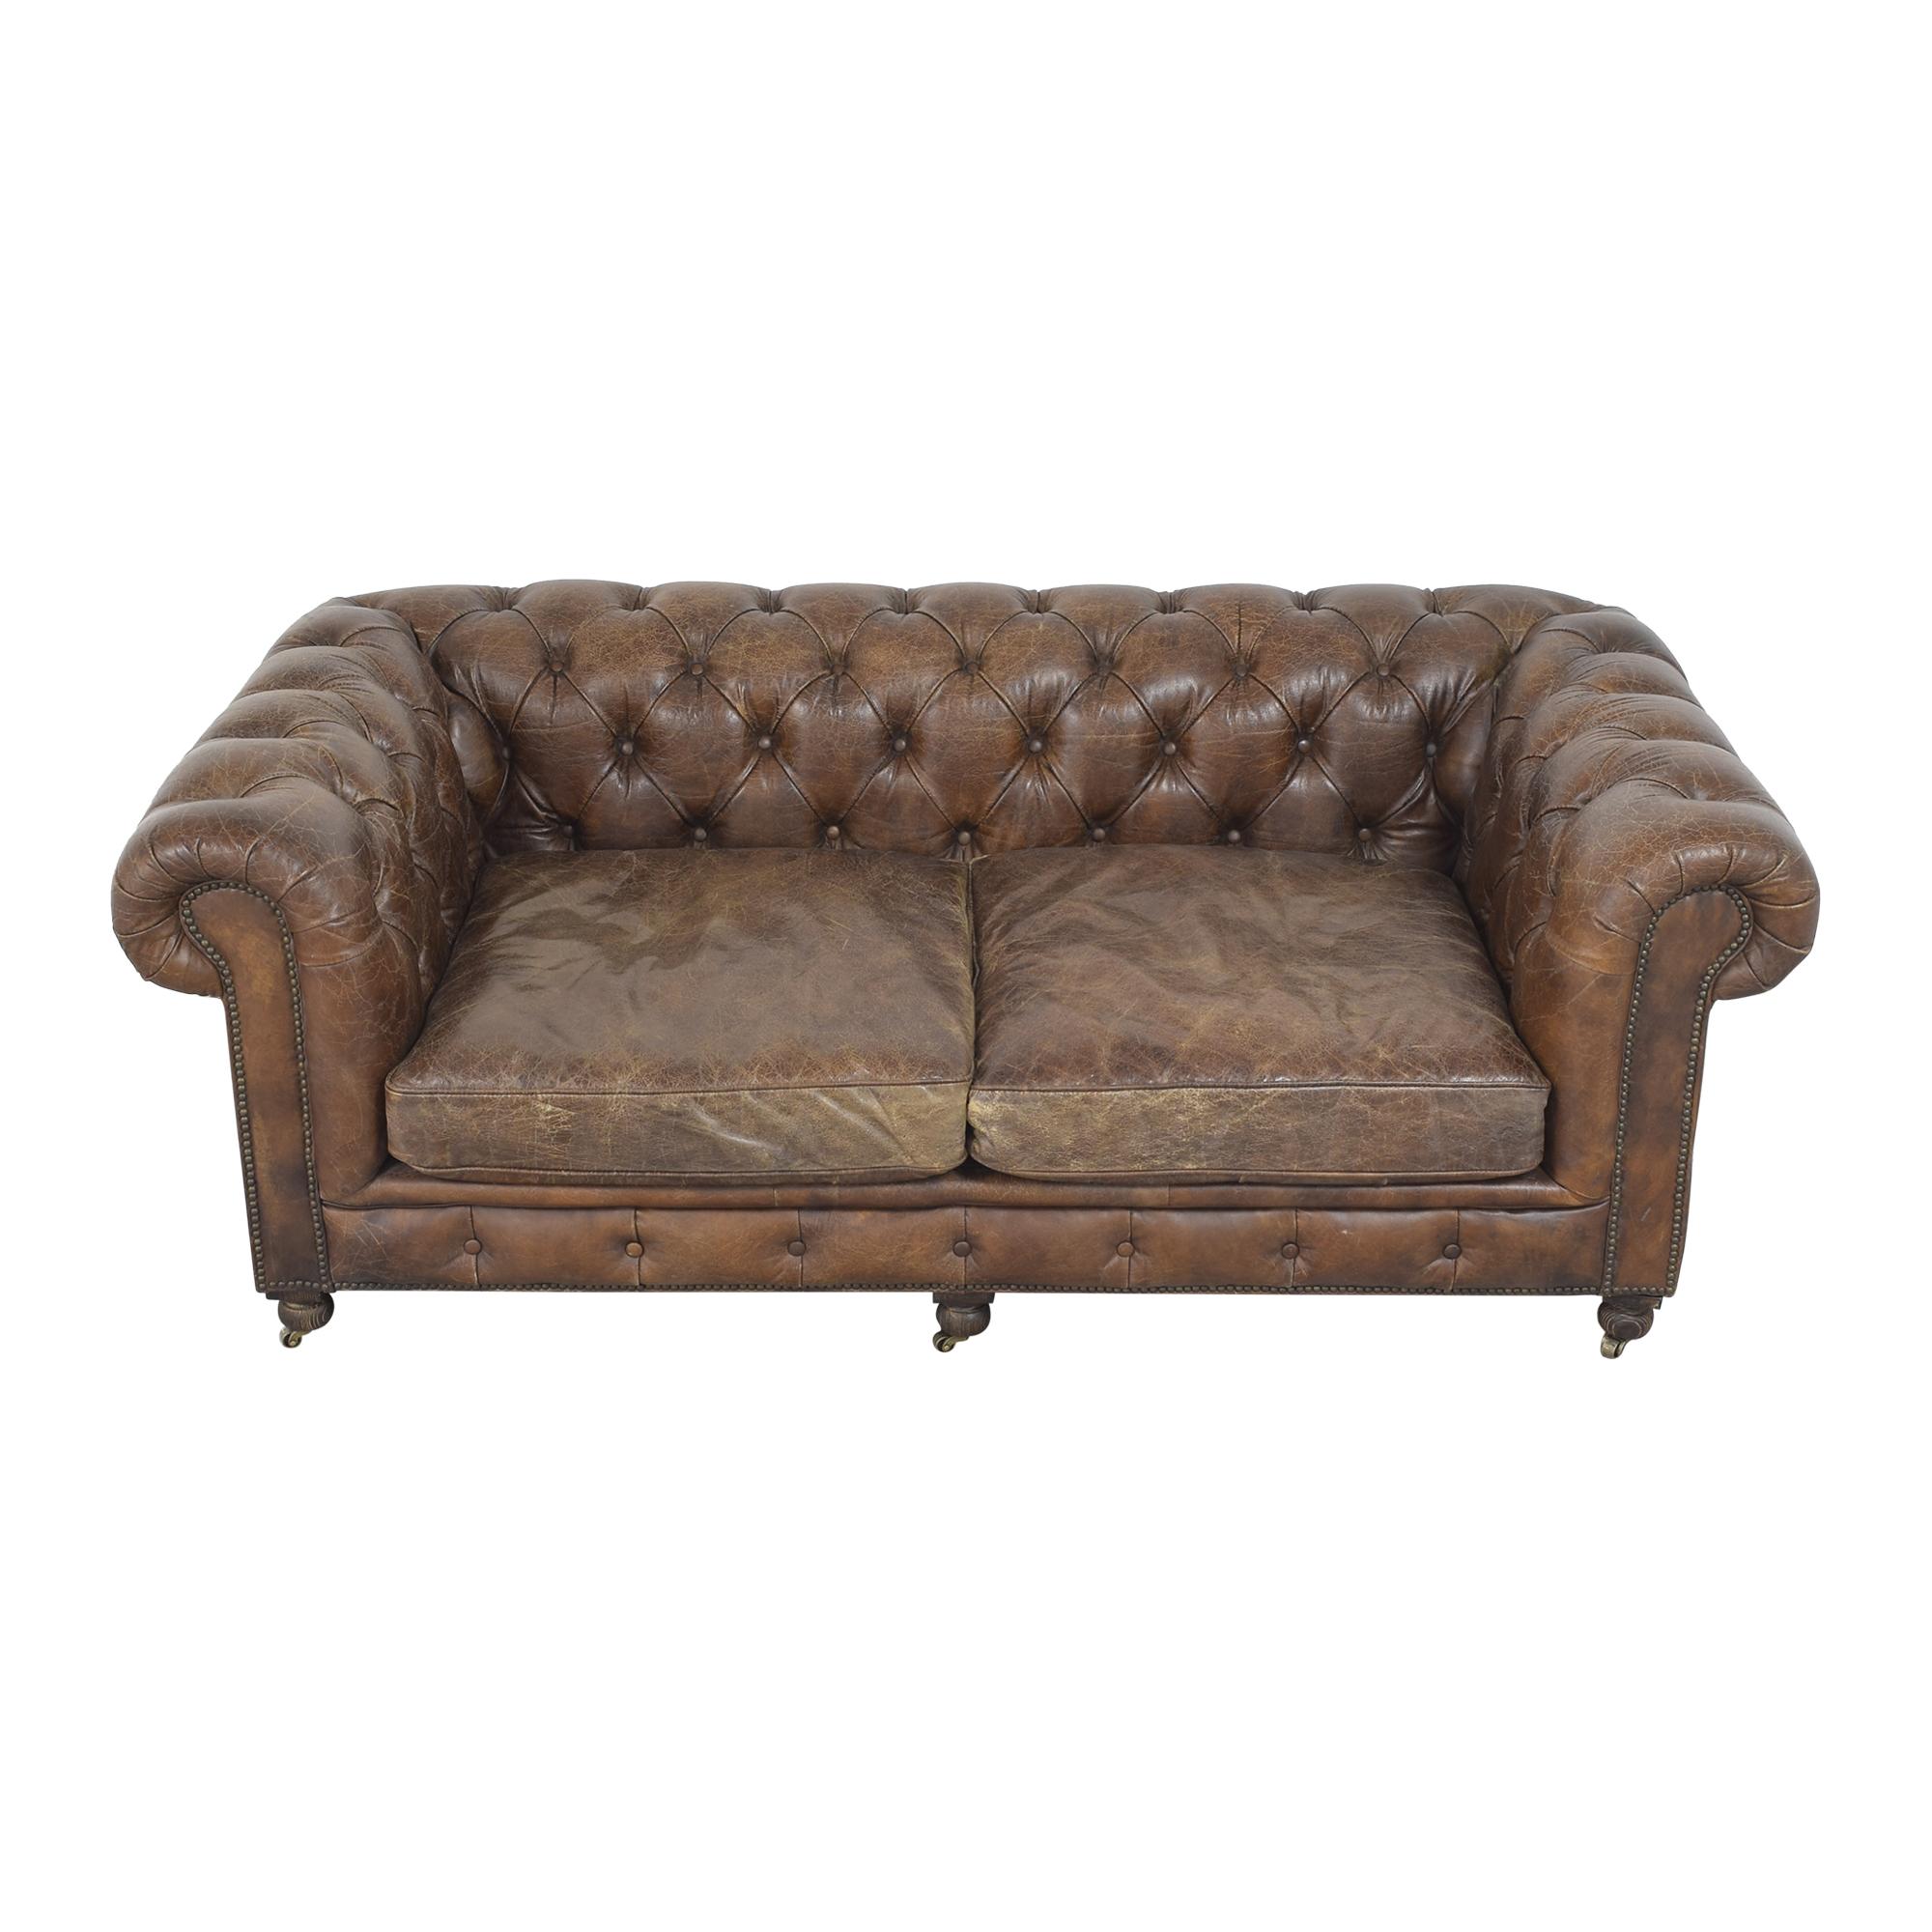 Restoration Hardware Kensington Sofa / Sofas